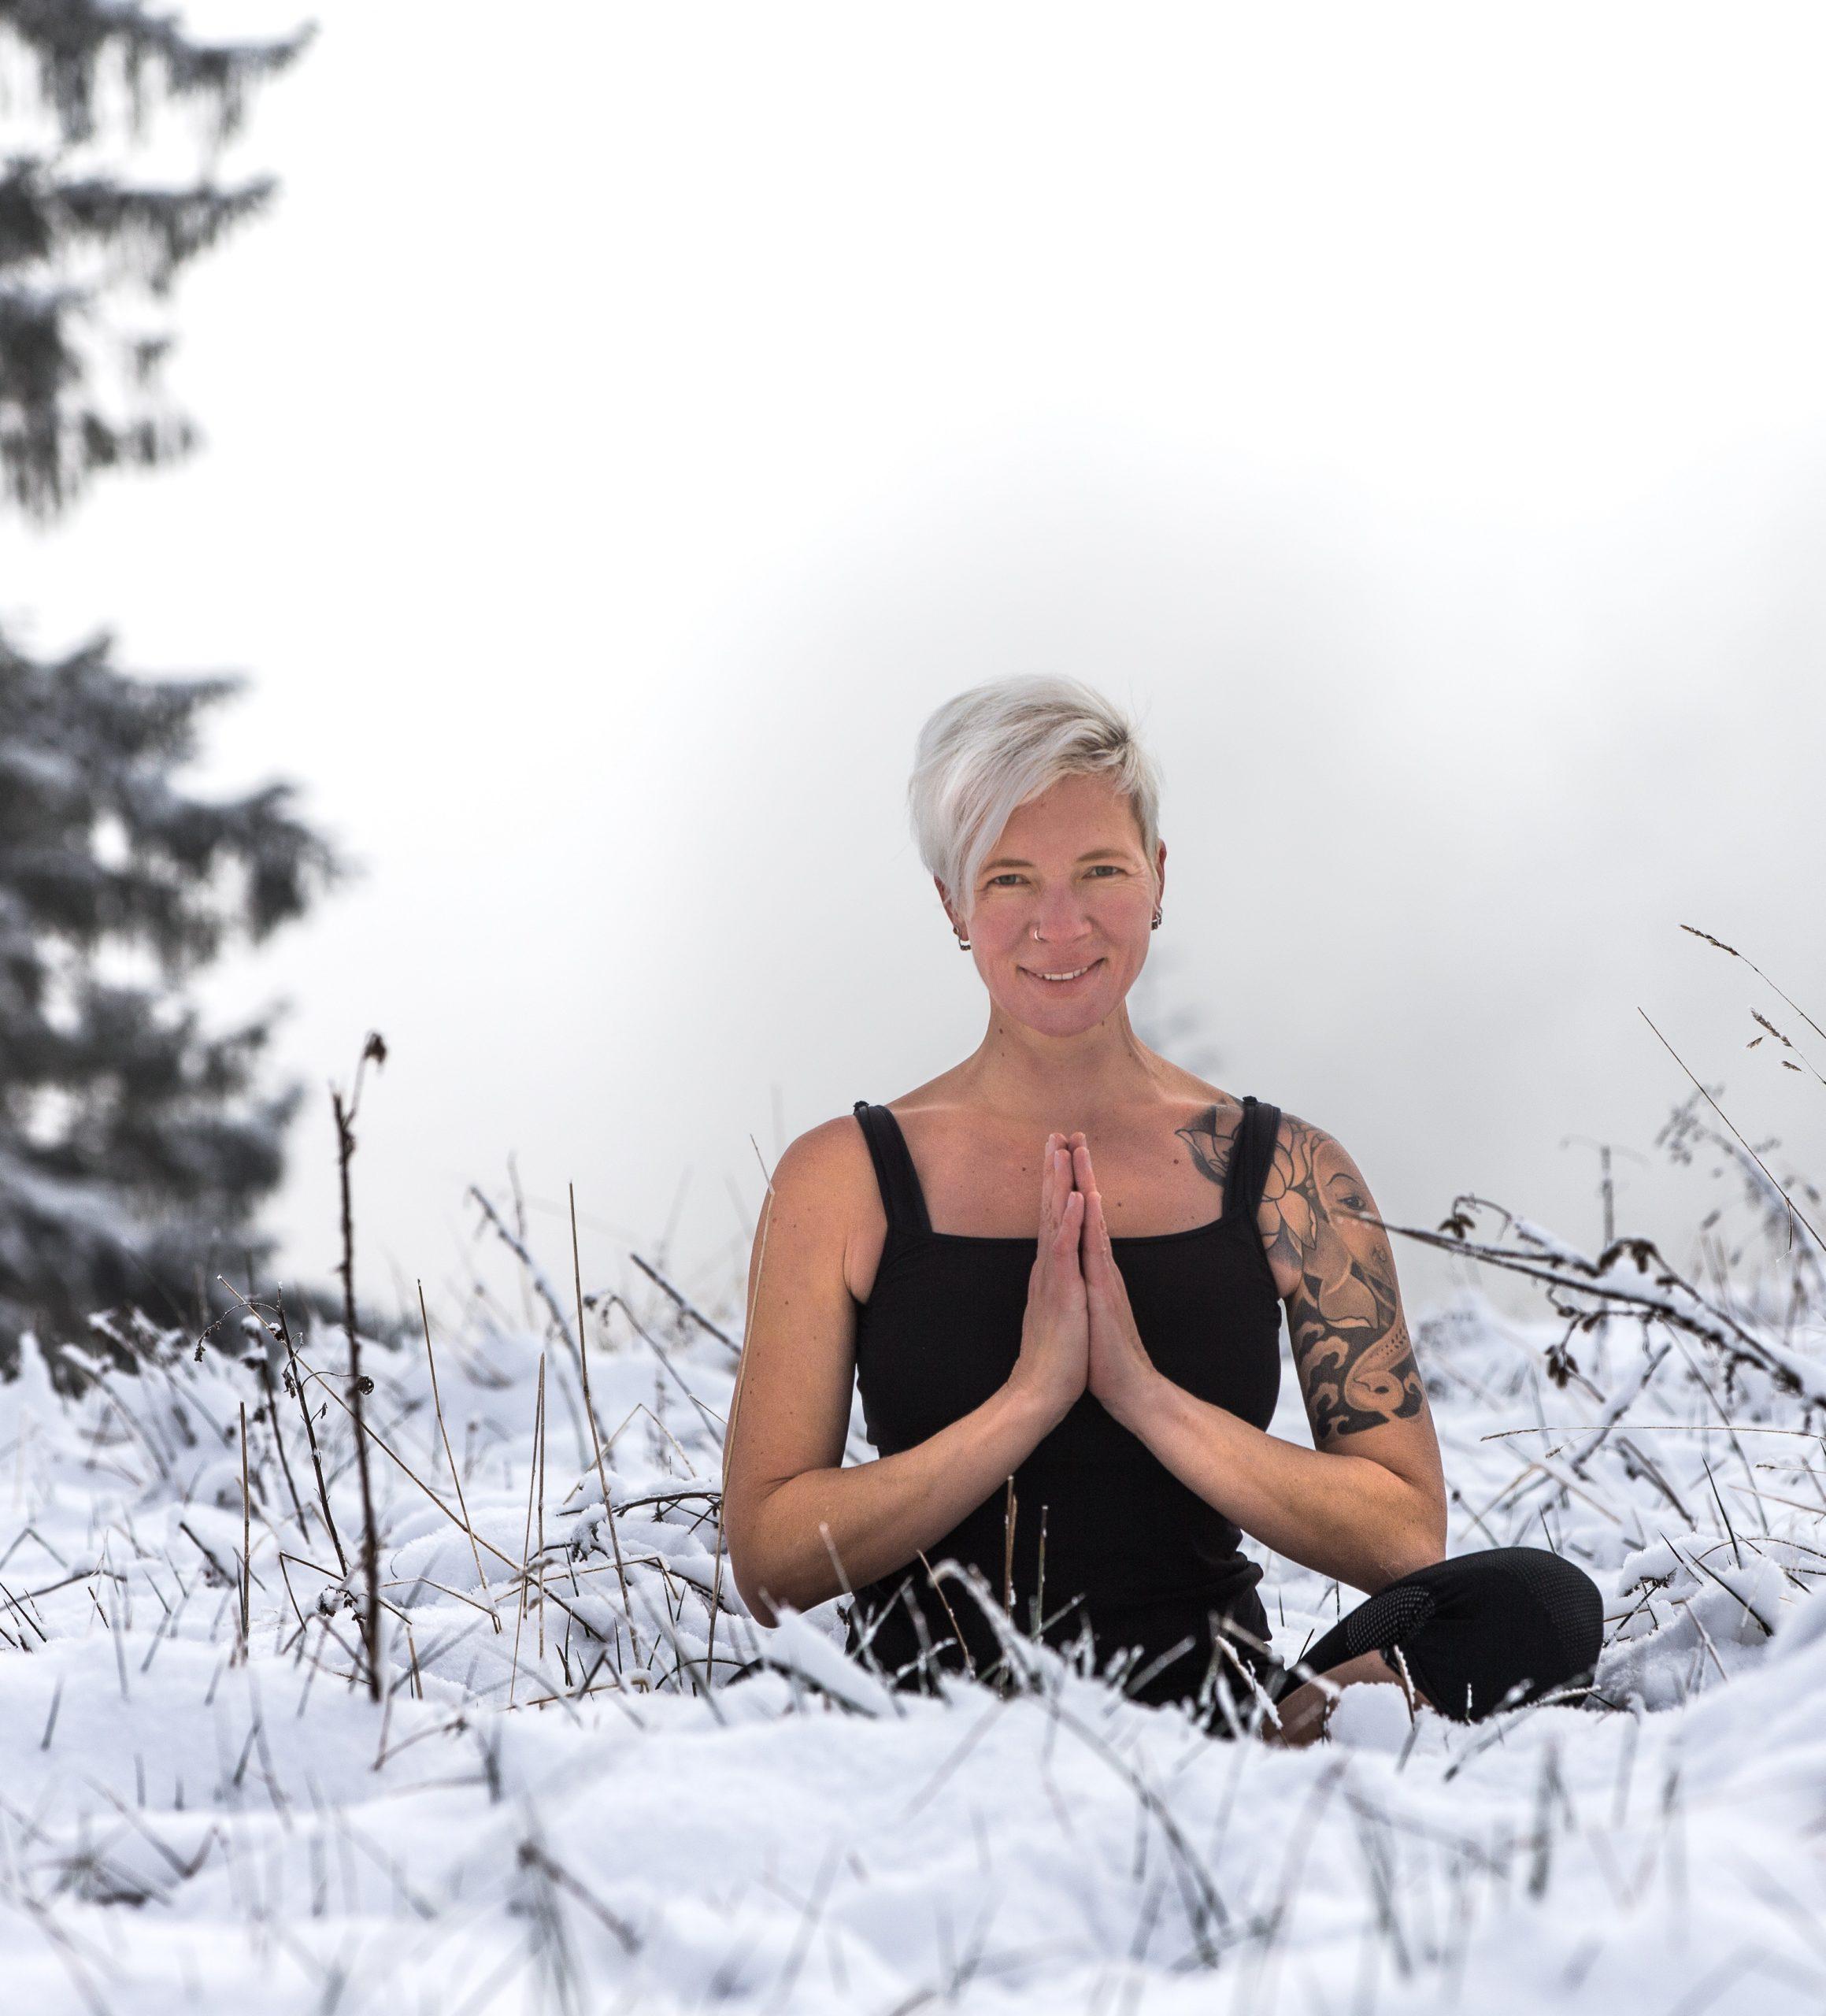 Hatha Yoga Lotussitz Miri Zinck